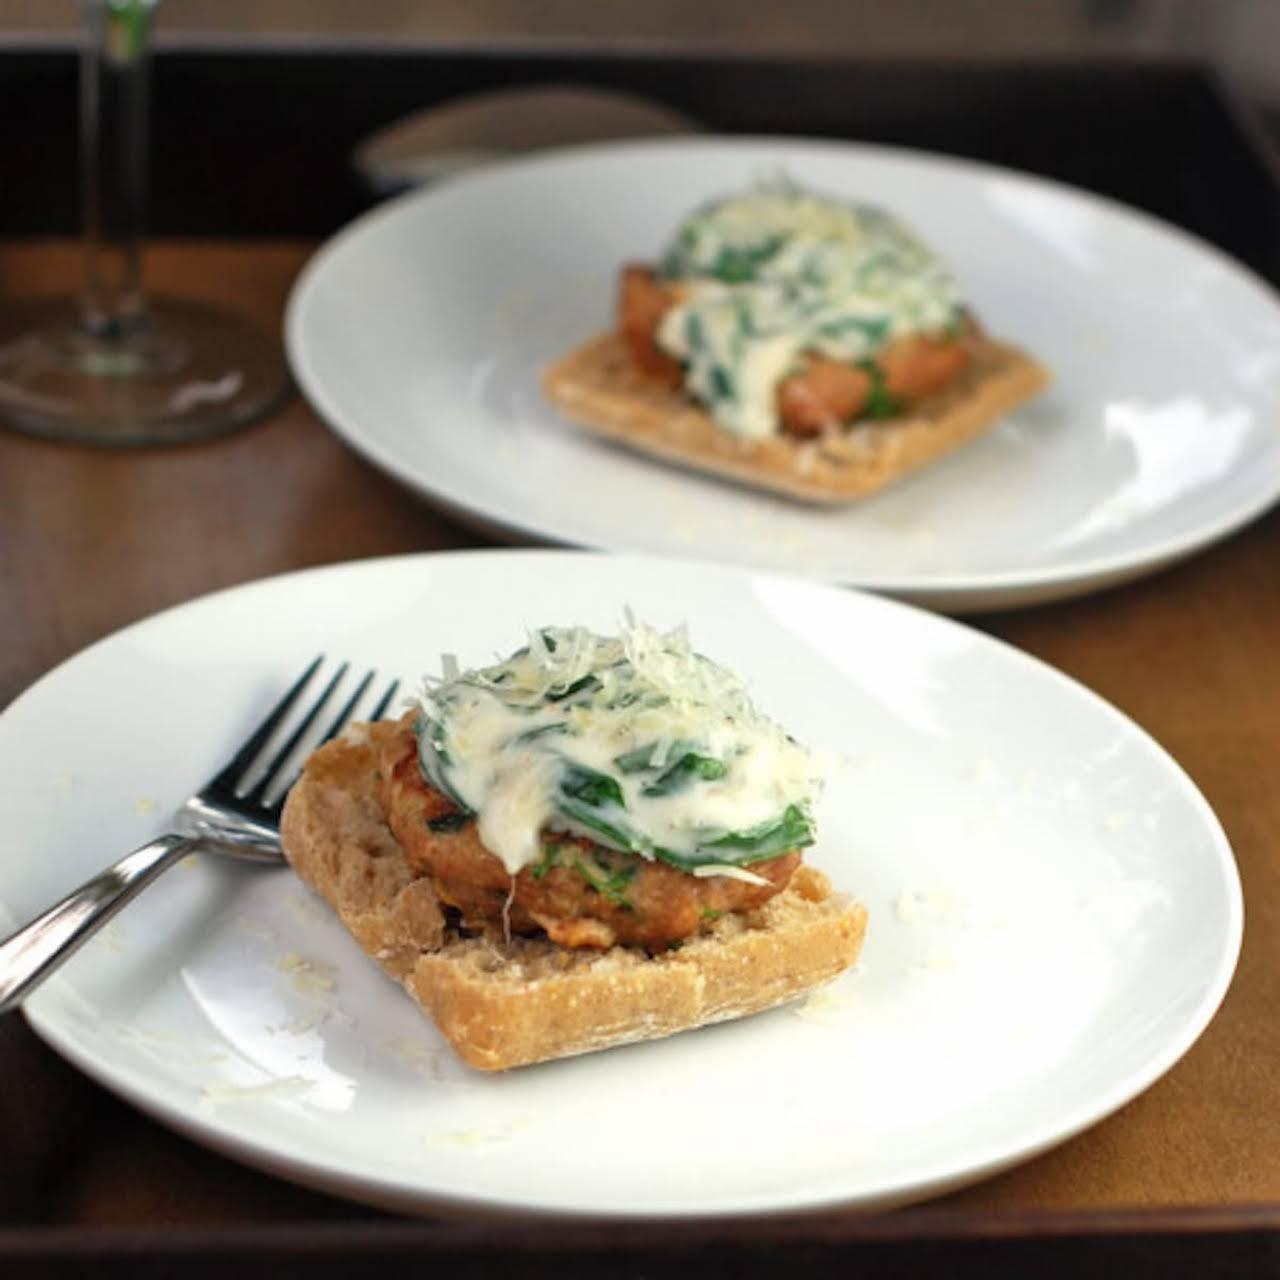 Garlic Parmesan Burgers & Creamed Spinach Sauce